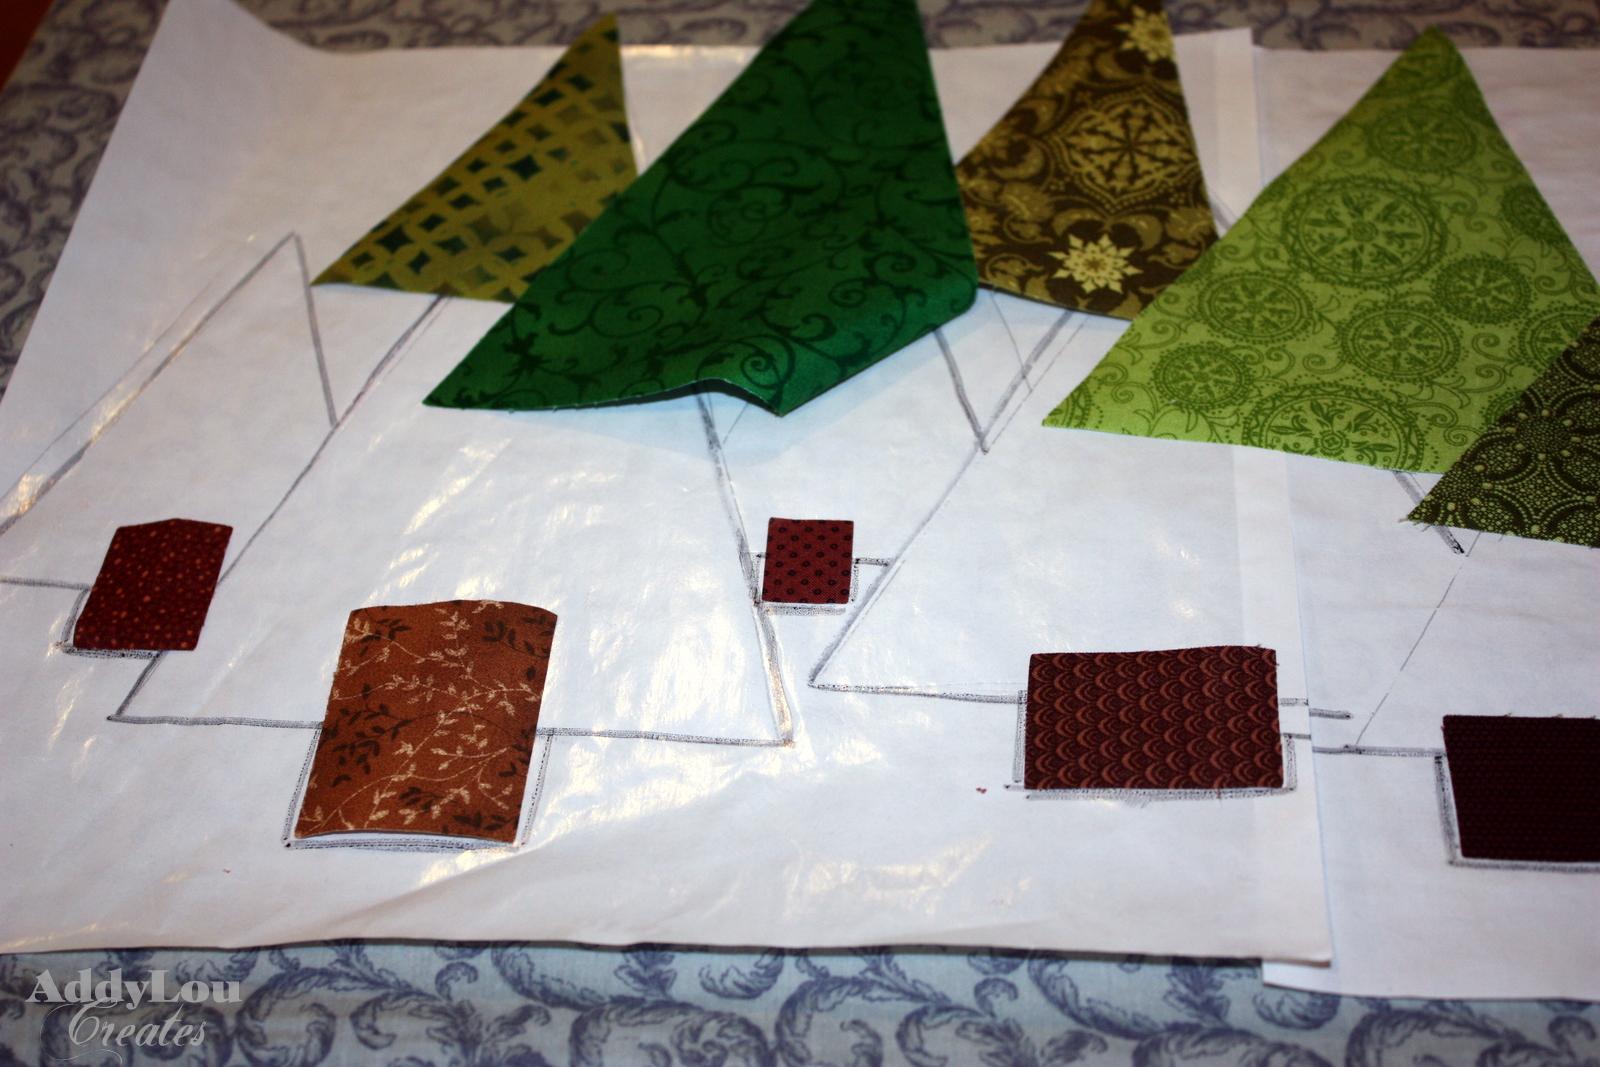 Addy Lou Creates: Handmade Christmas Cheer {Tree Table